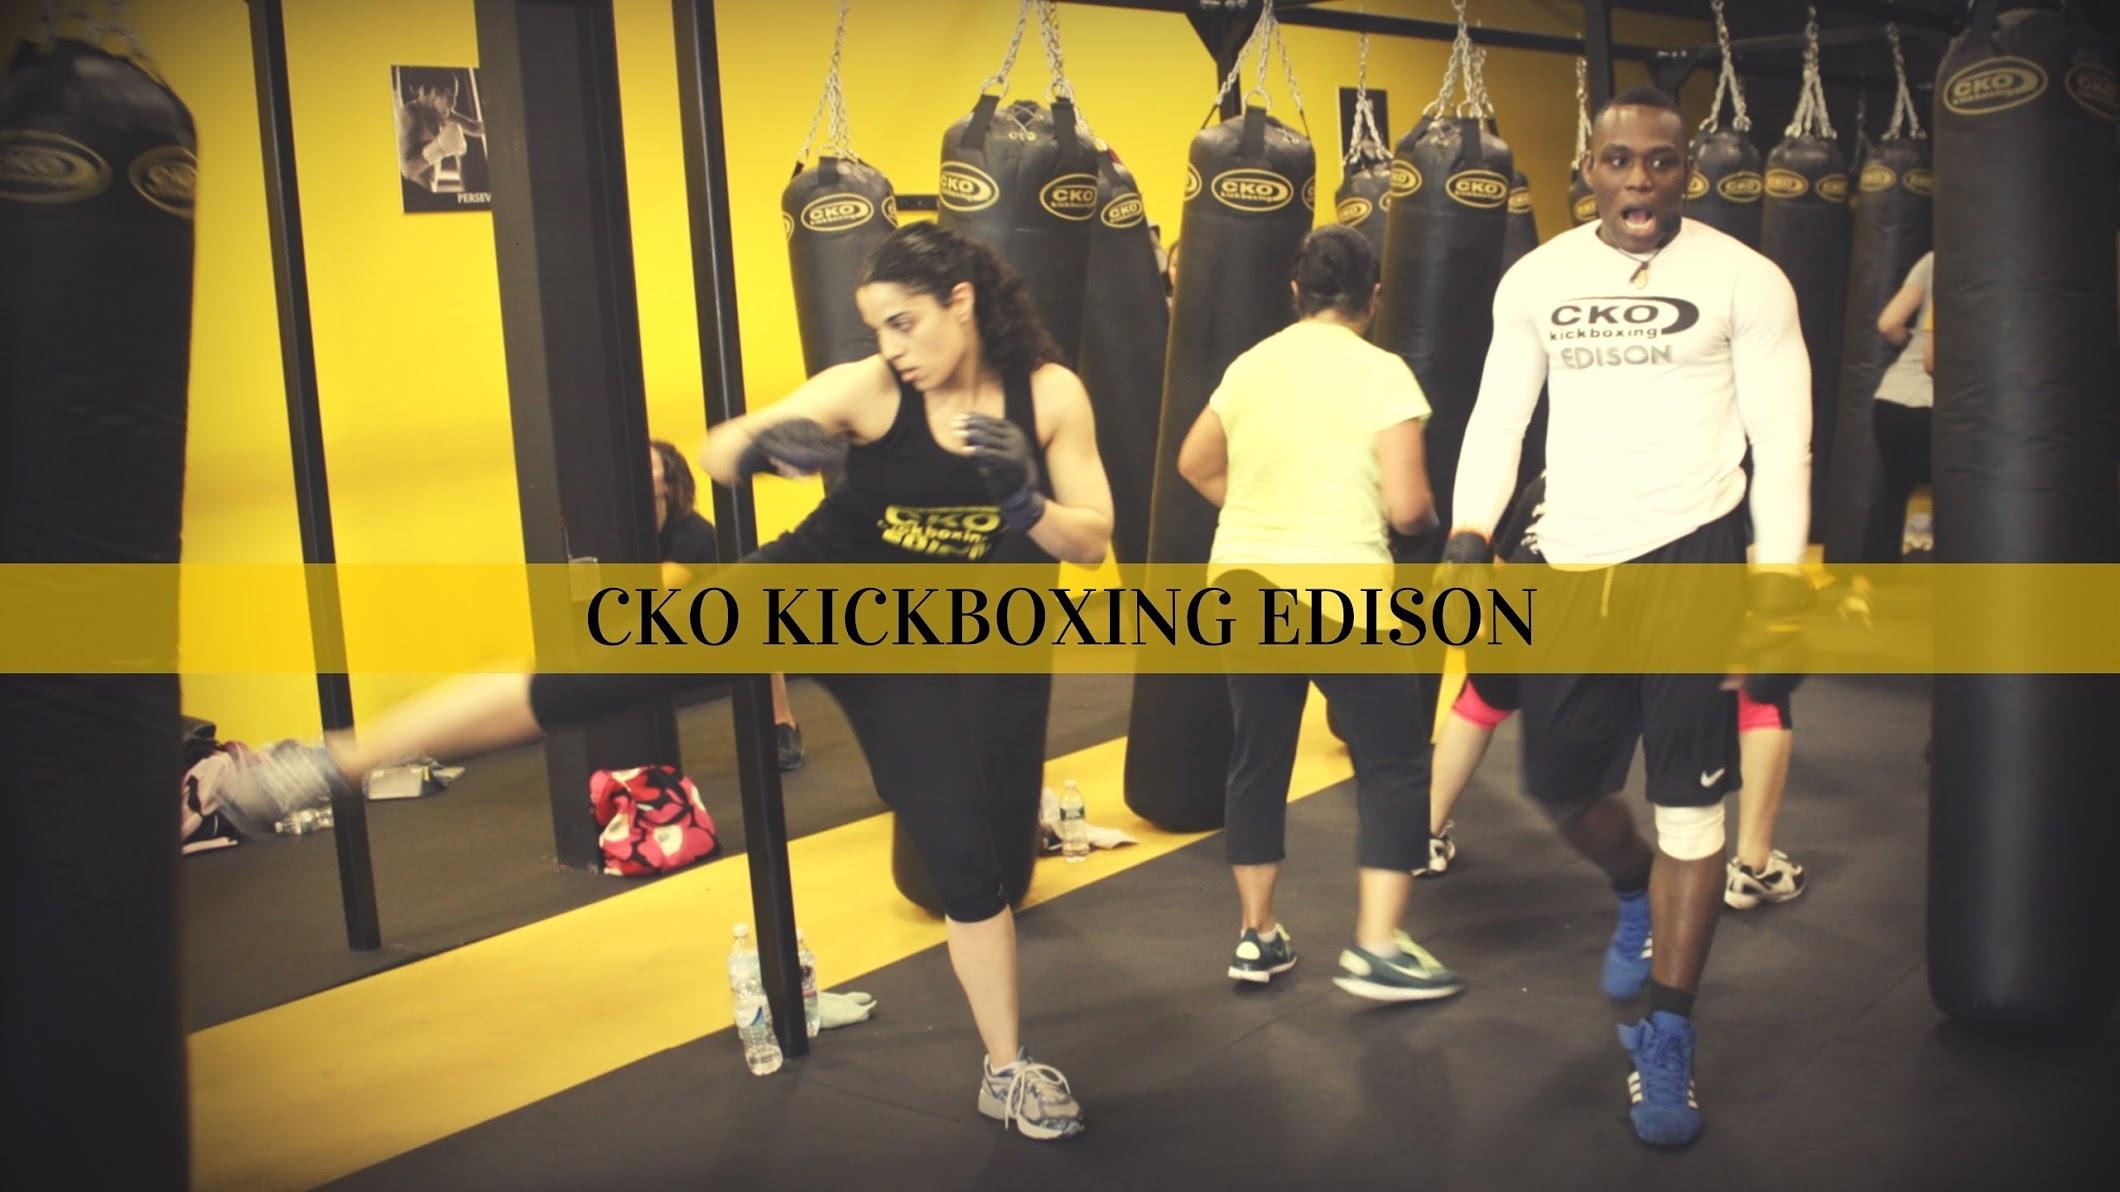 CKO Kickboxing Edison - YouTube